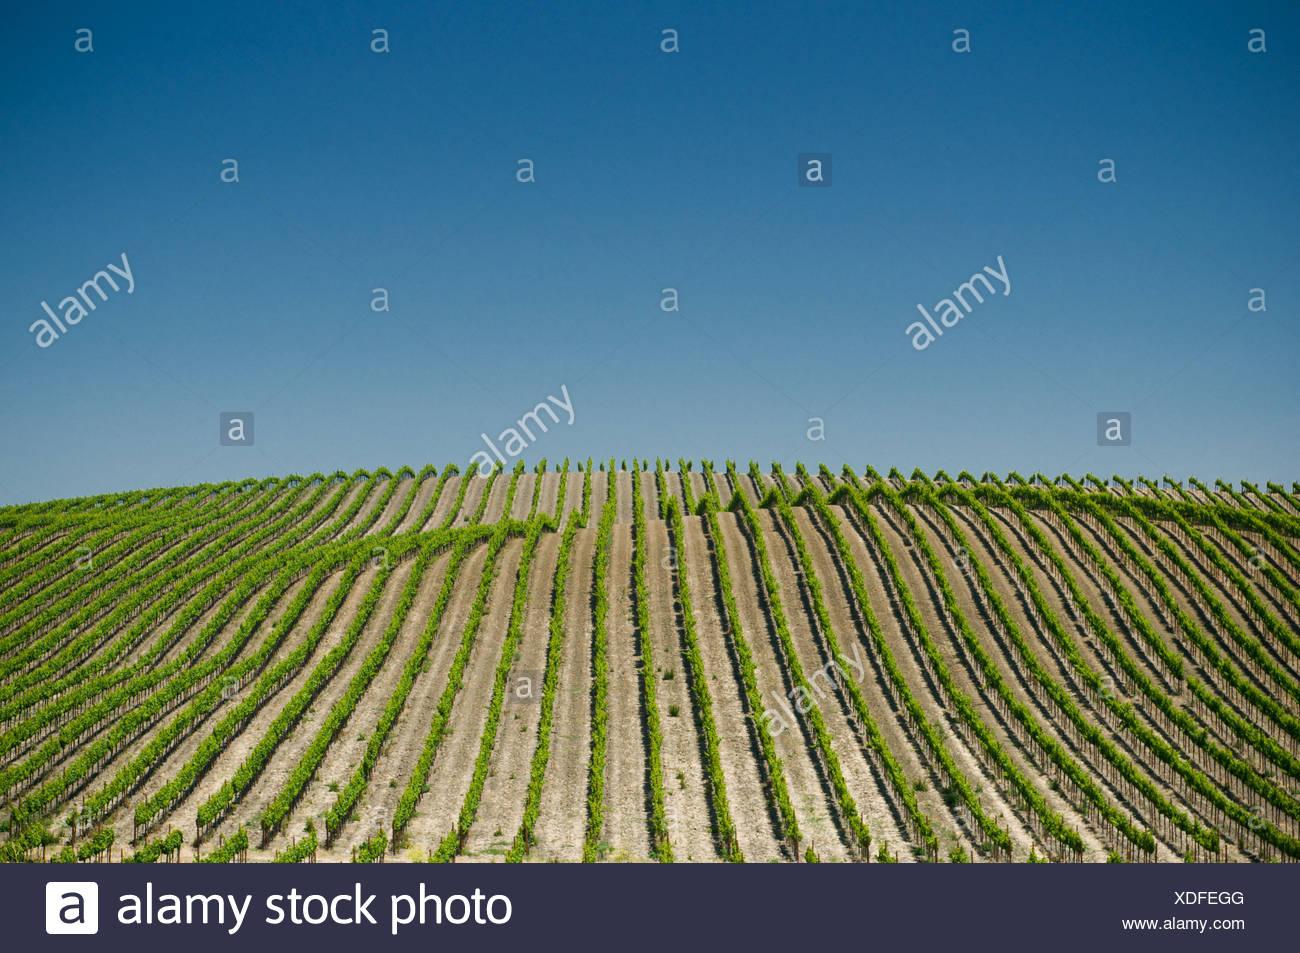 Sonoma Valley Vineyards Stock Photos Amp Sonoma Valley